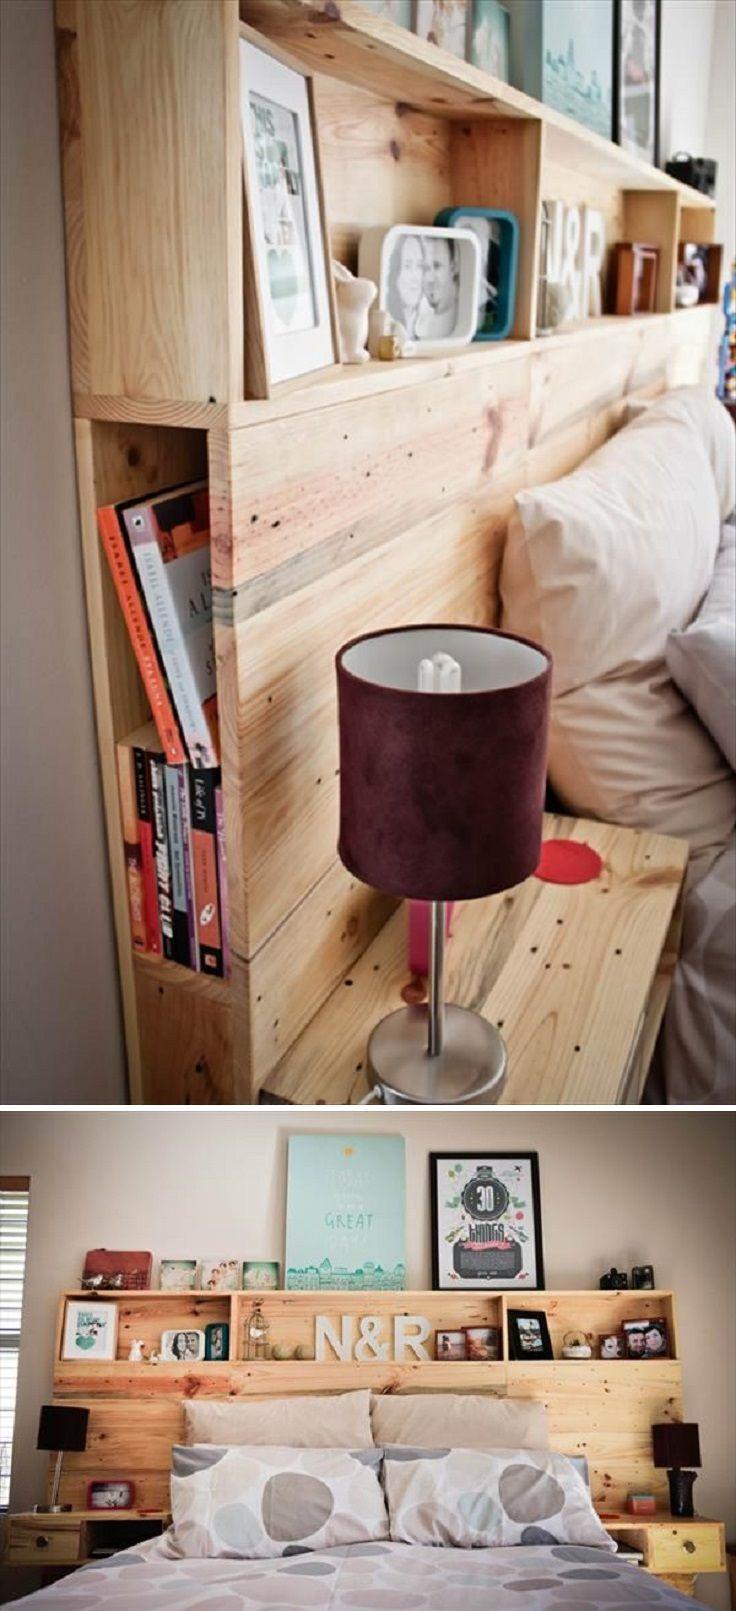 Diy pallet headboard with shelves easy headboard diys for your